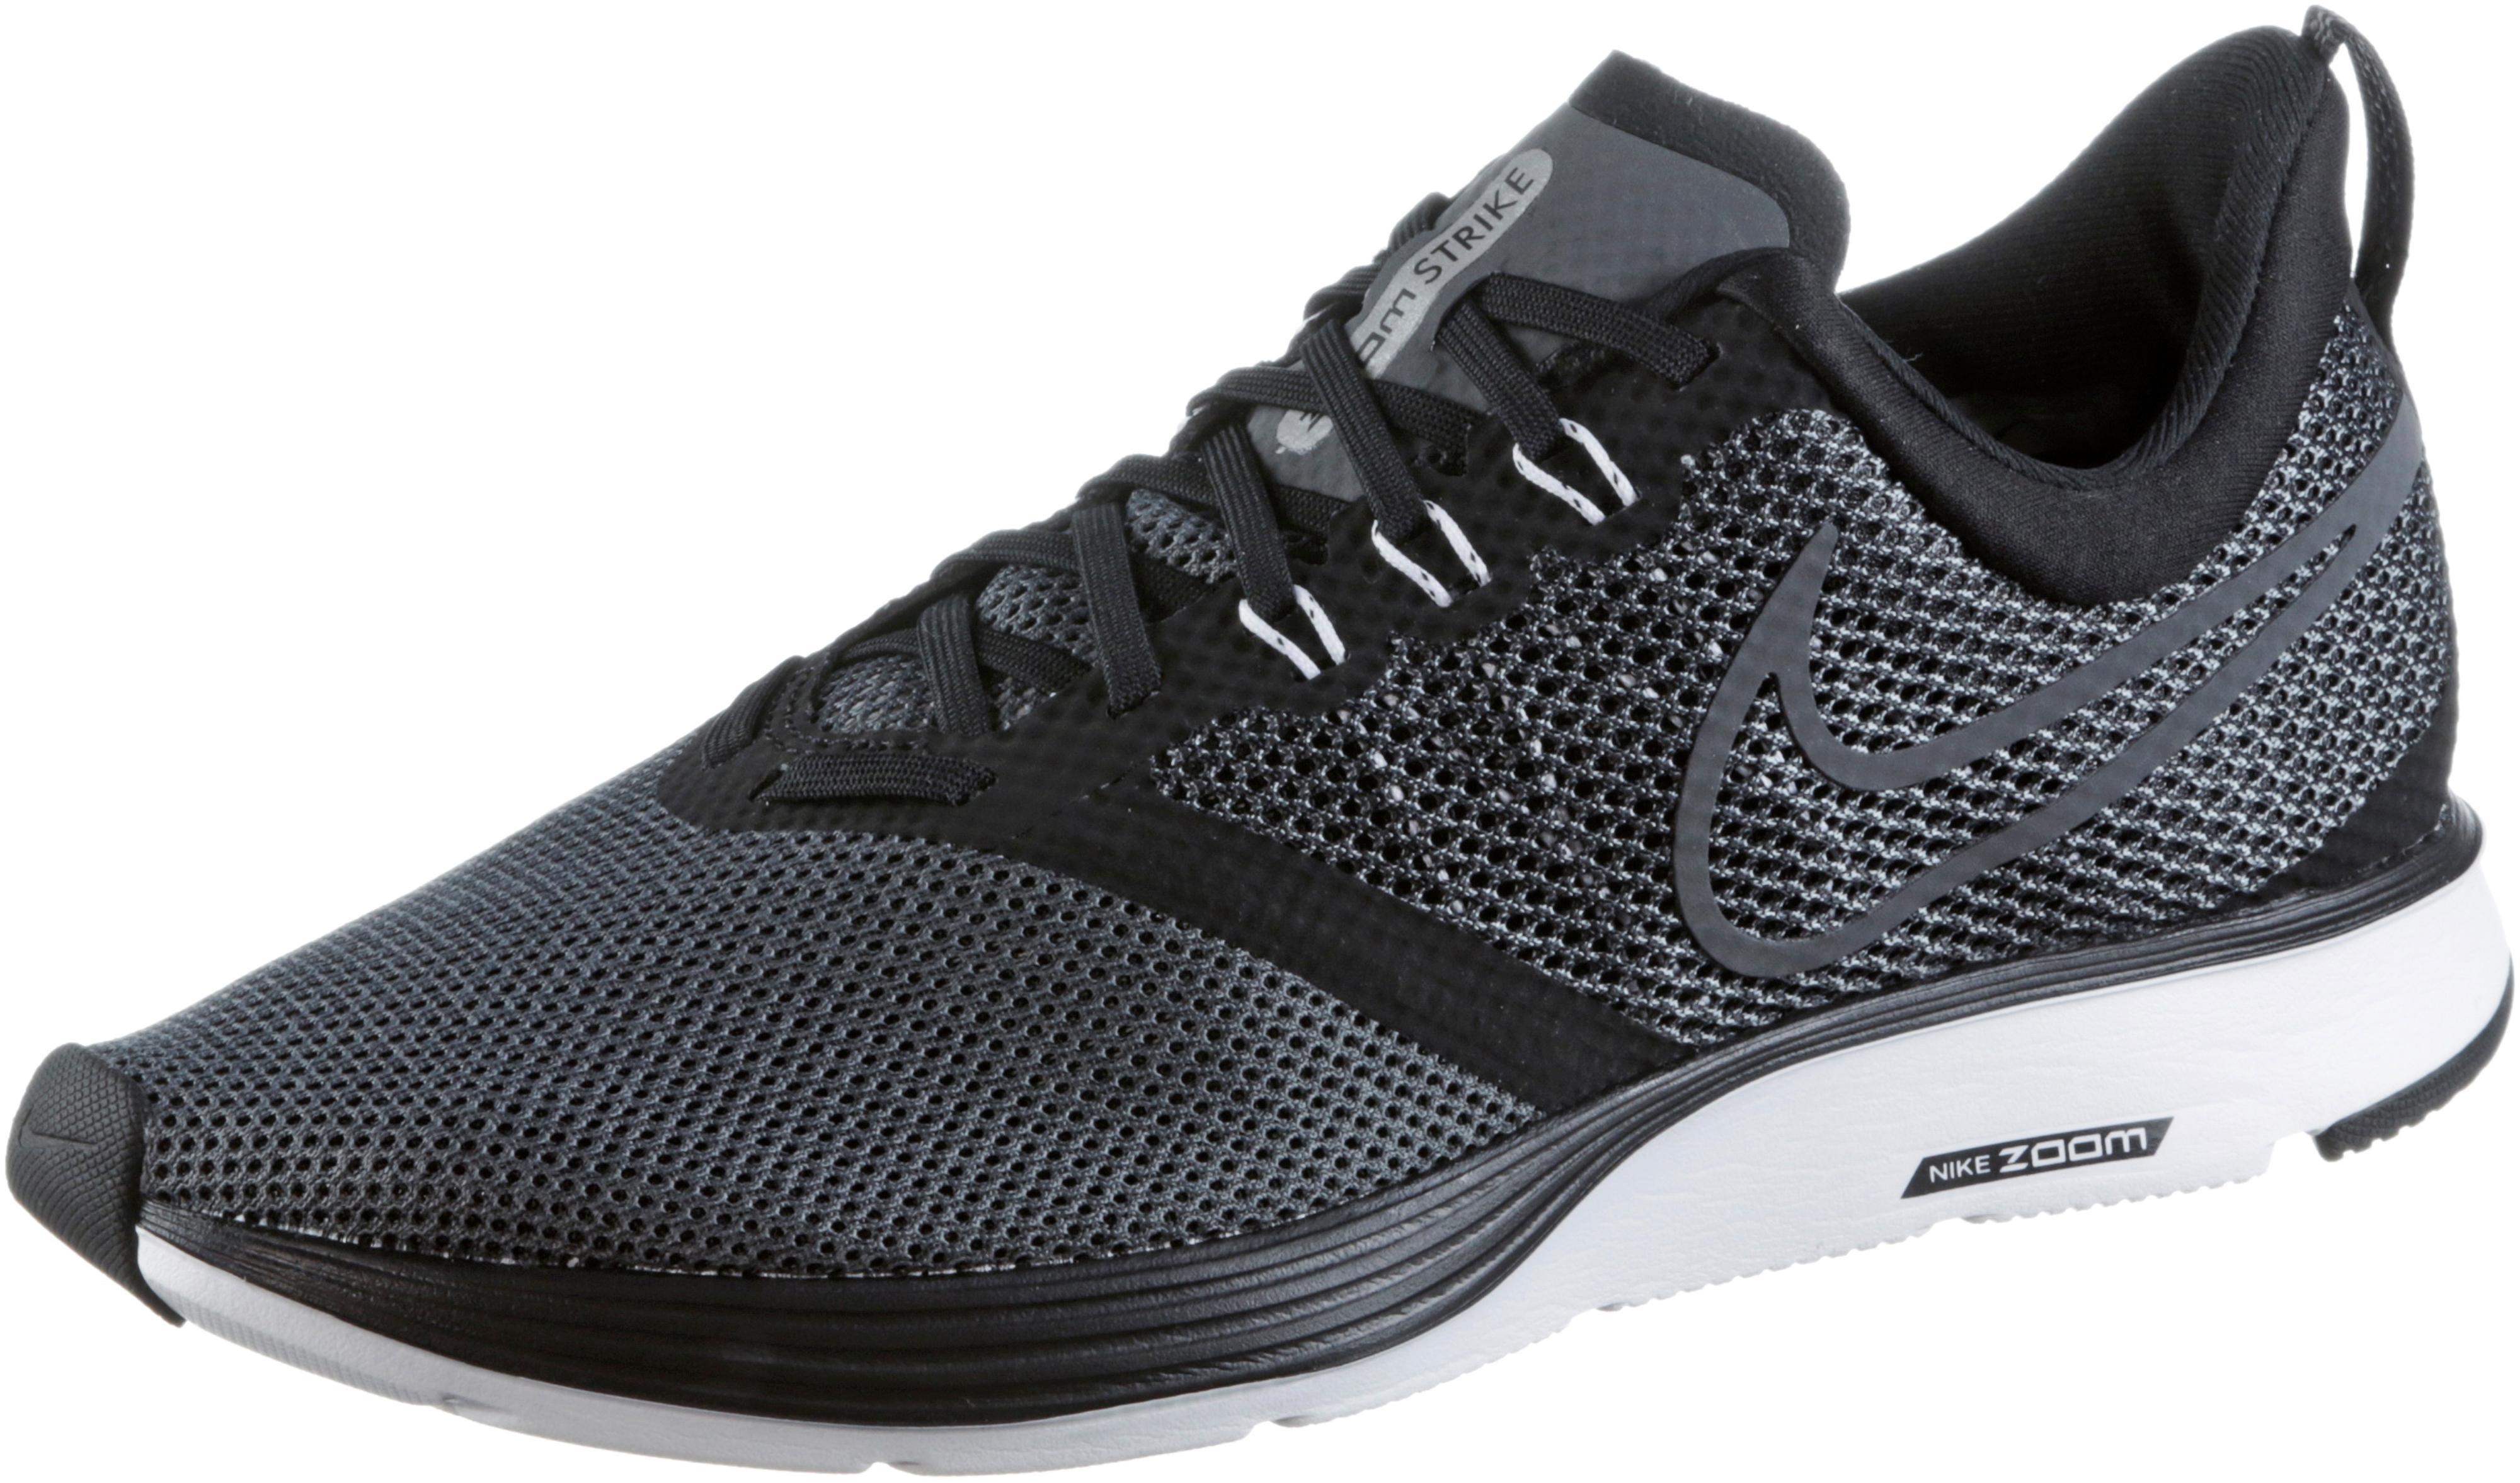 Nike Nike Nike ZOOM STRIKE Laufschuhe Herren schwarz Weiß